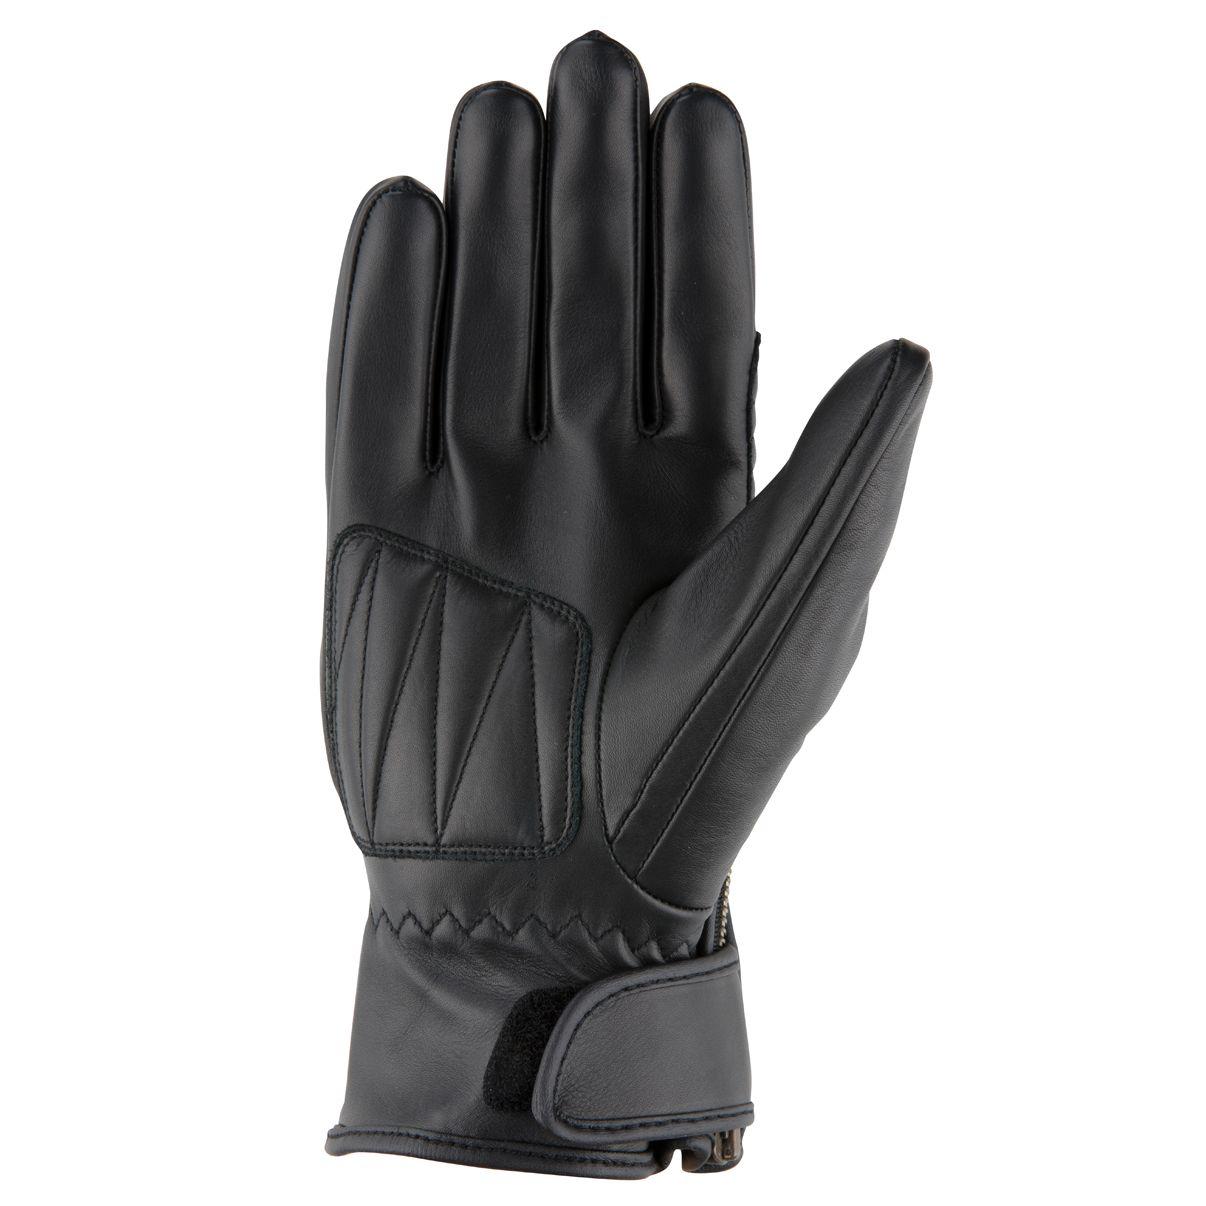 gants v quattro dust equipement du pilote access. Black Bedroom Furniture Sets. Home Design Ideas